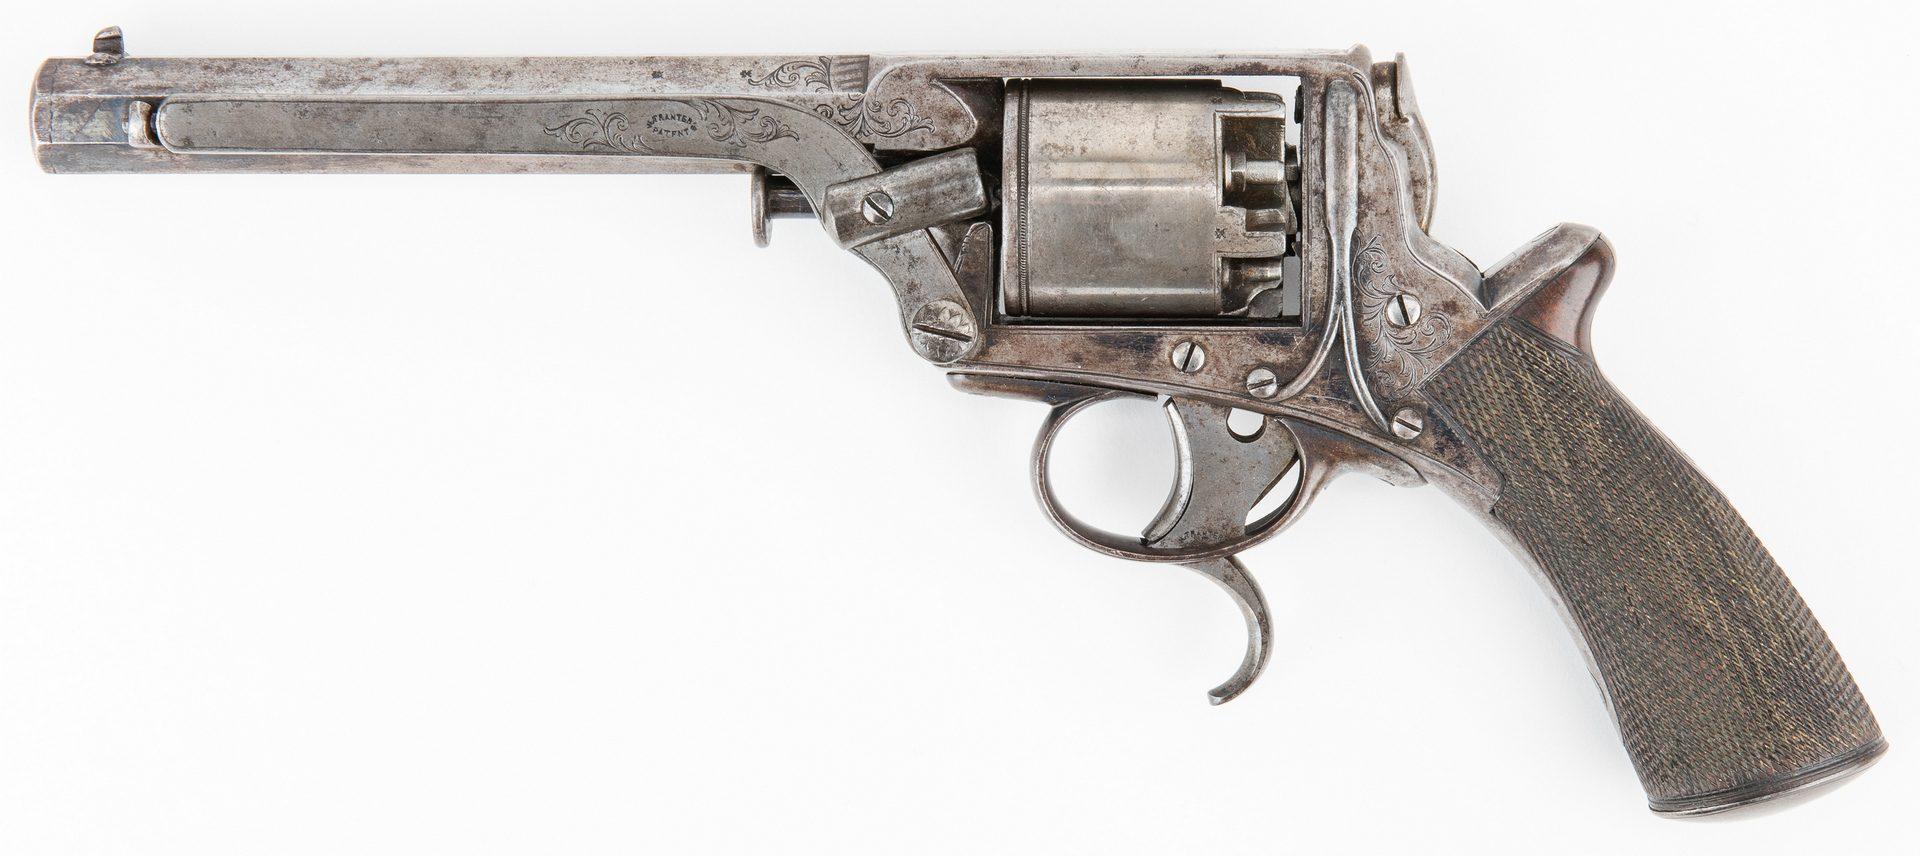 Lot 298: Hyde & Goodrich New Orleans Agent Marked Tranter Revolver, SN 8803